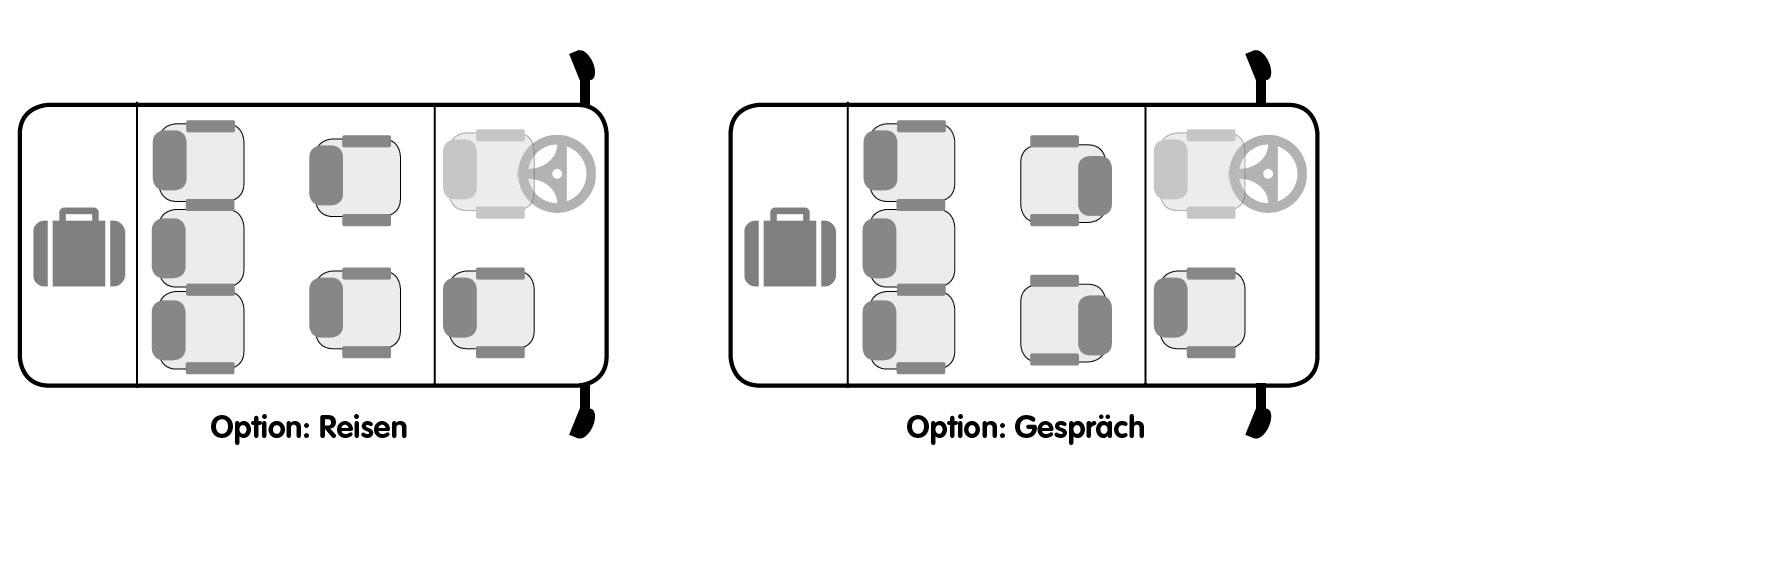 Sitzplatzspiegel_T6